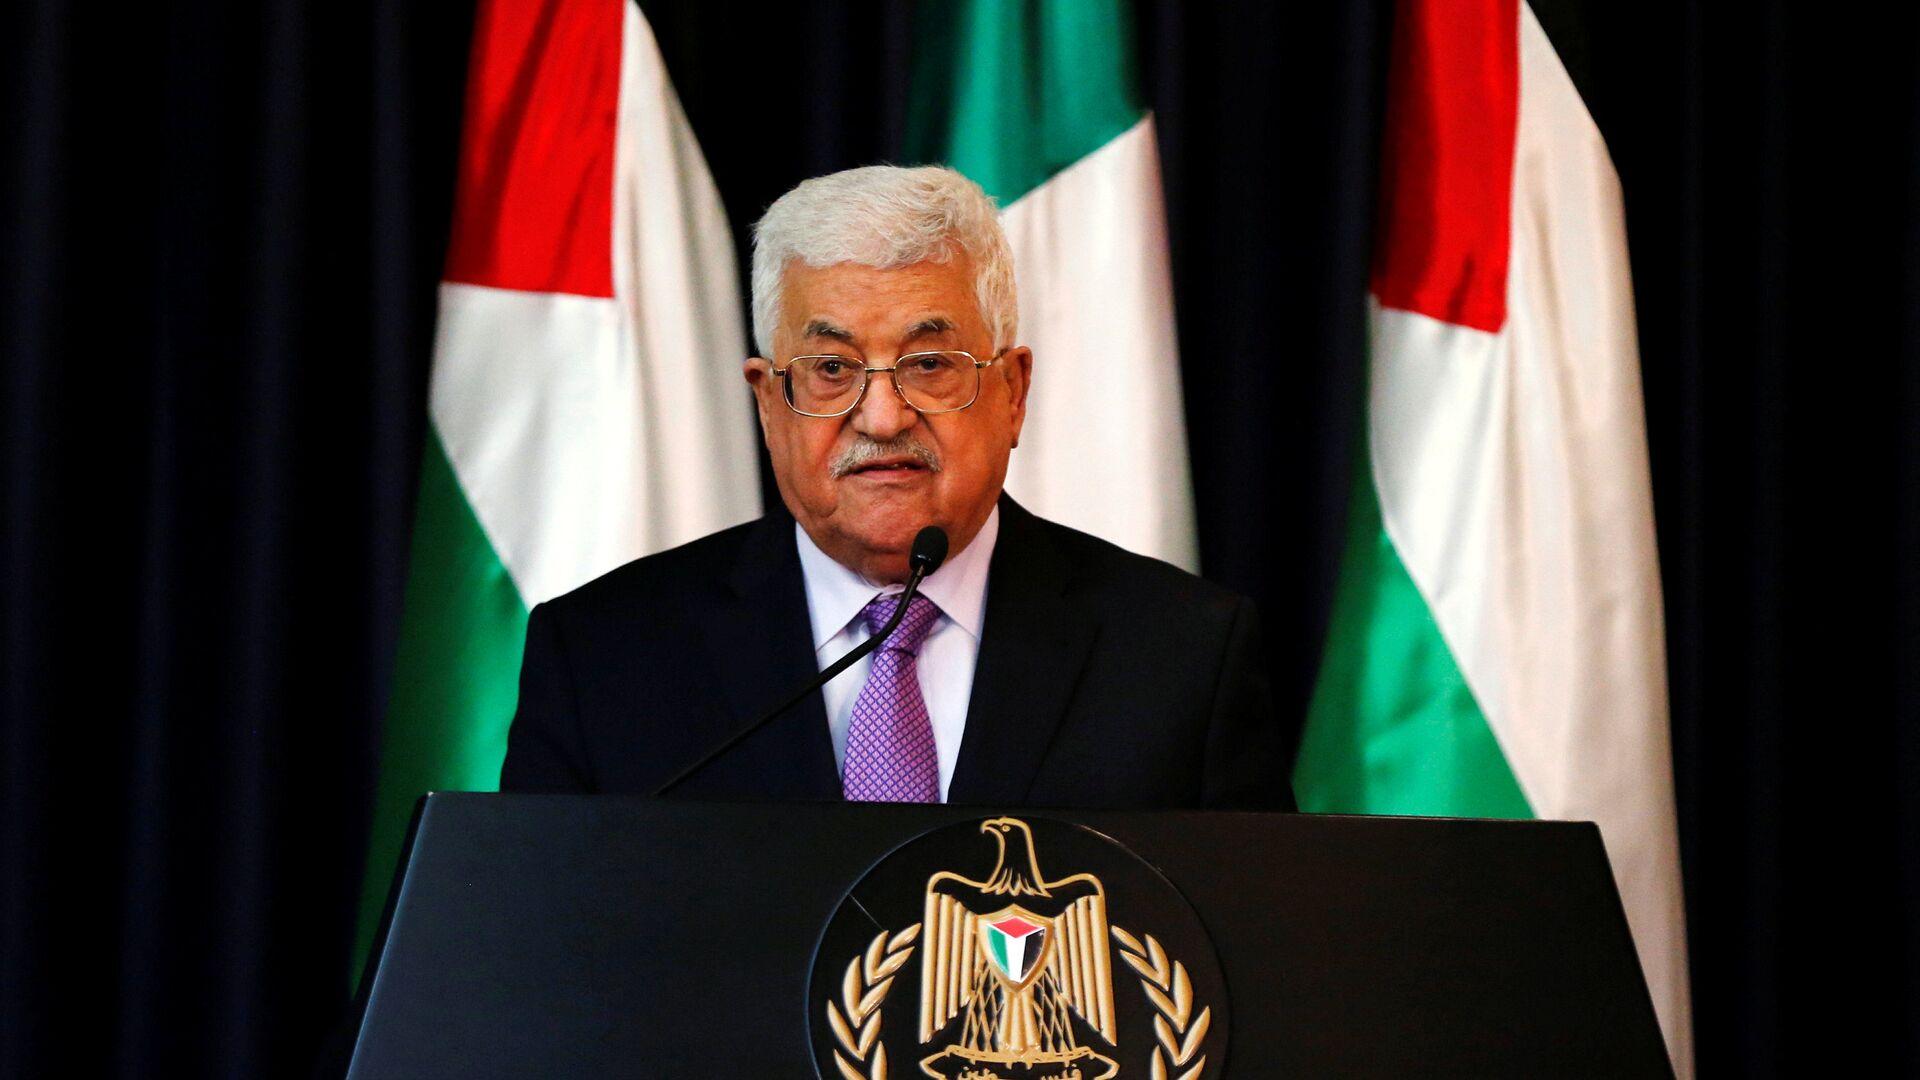 Mahmud Abás, presidente de Palestina - Sputnik Mundo, 1920, 22.09.2021